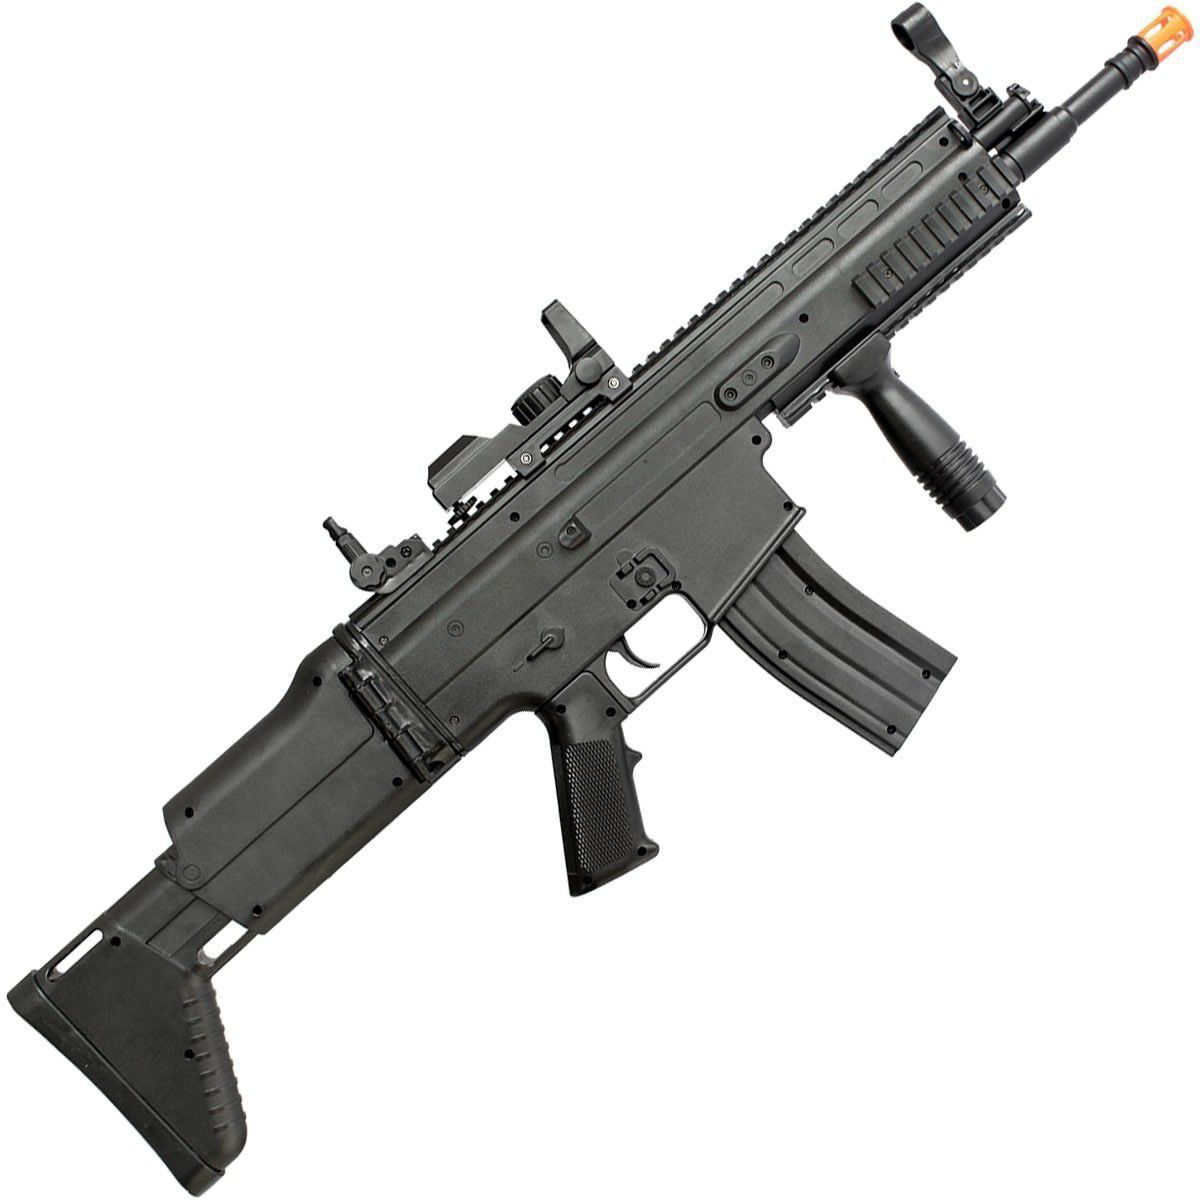 Rifle de Airsoft FN Scar-L Spring/Mola Preto - Cal 6mm - Cybergun